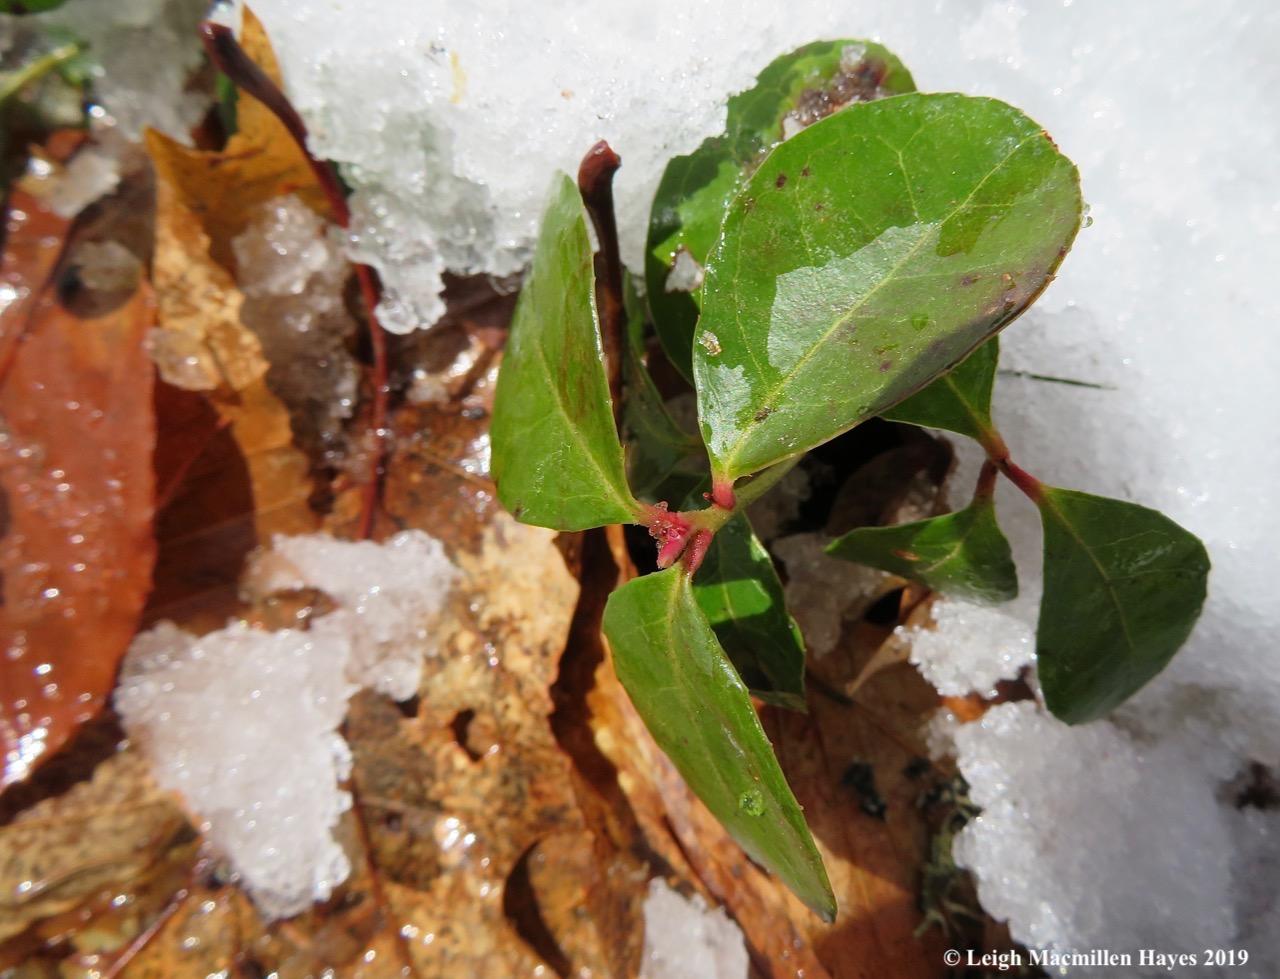 16-wintergreen-with-buds.jpg